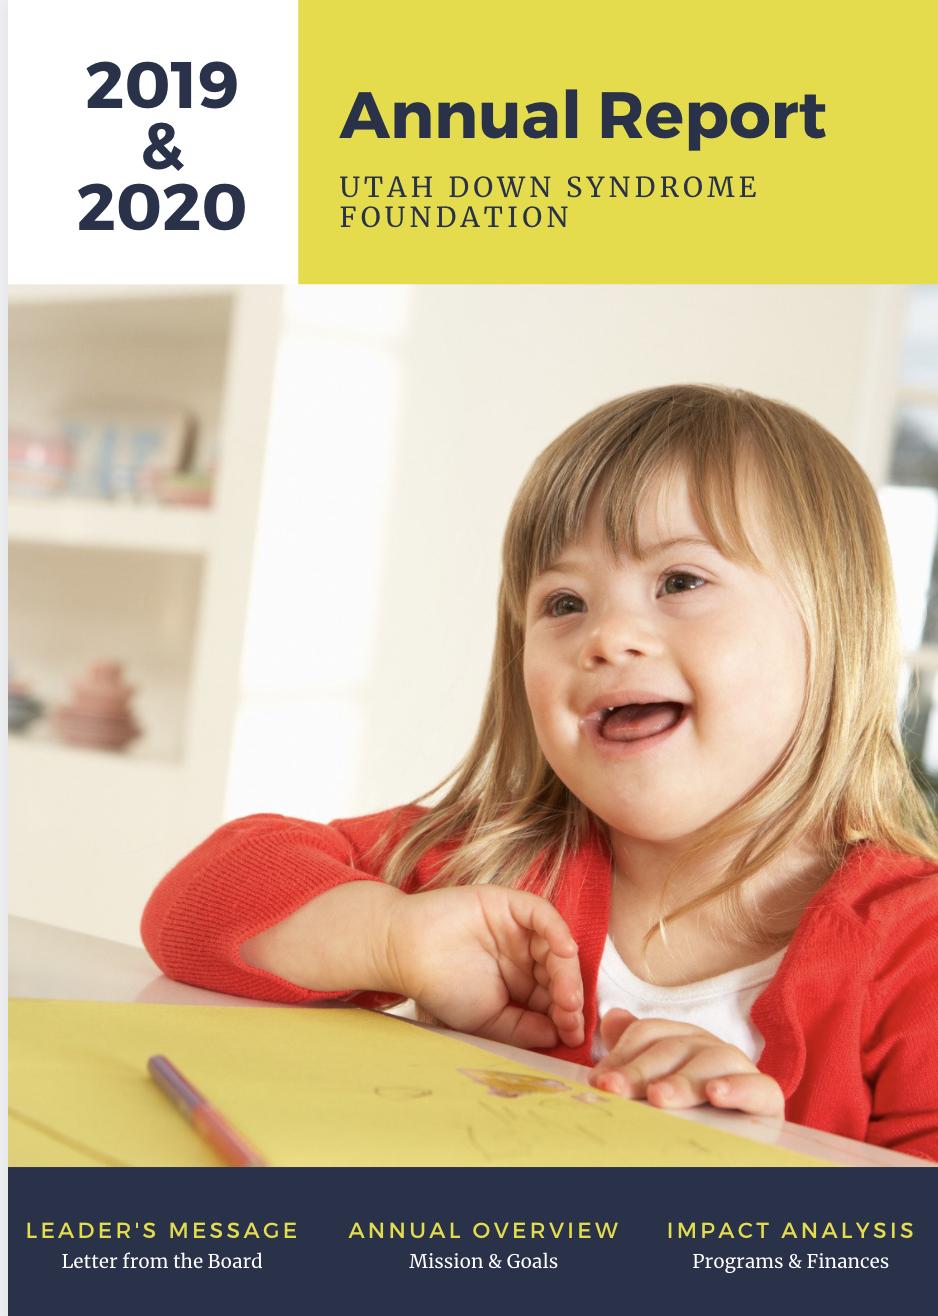 2019 & 2020 Annual Report